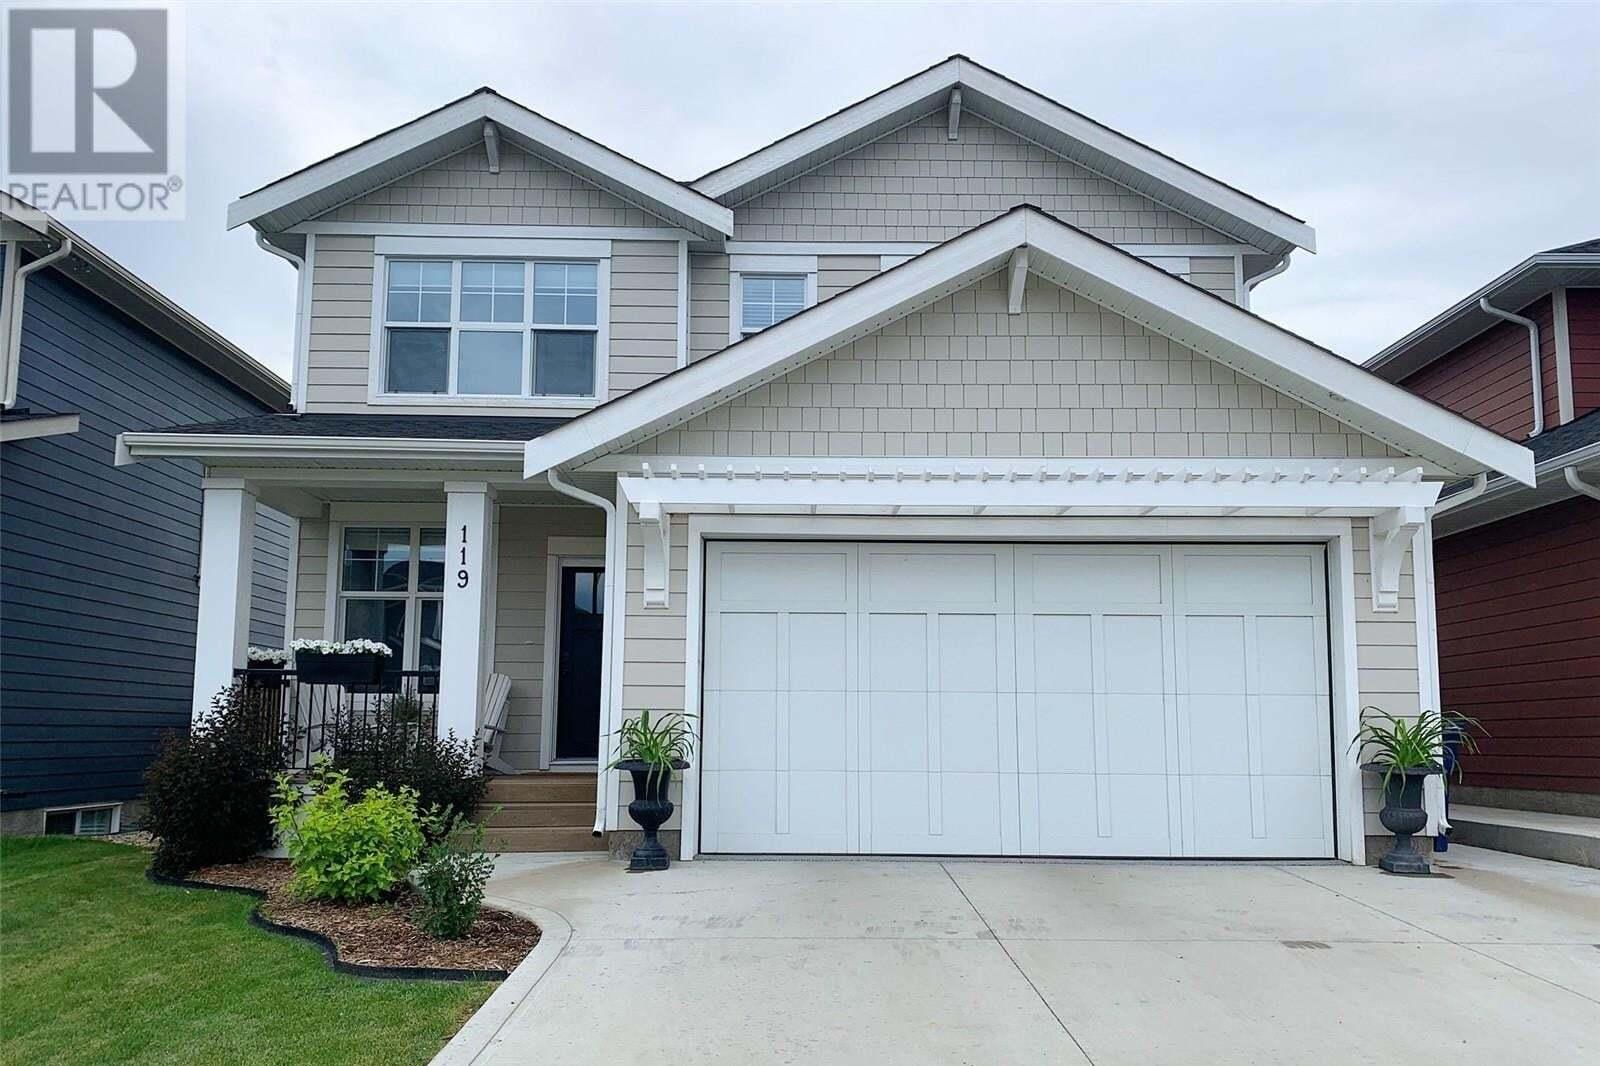 House for sale at 119 Eaton Cres Saskatoon Saskatchewan - MLS: SK817335